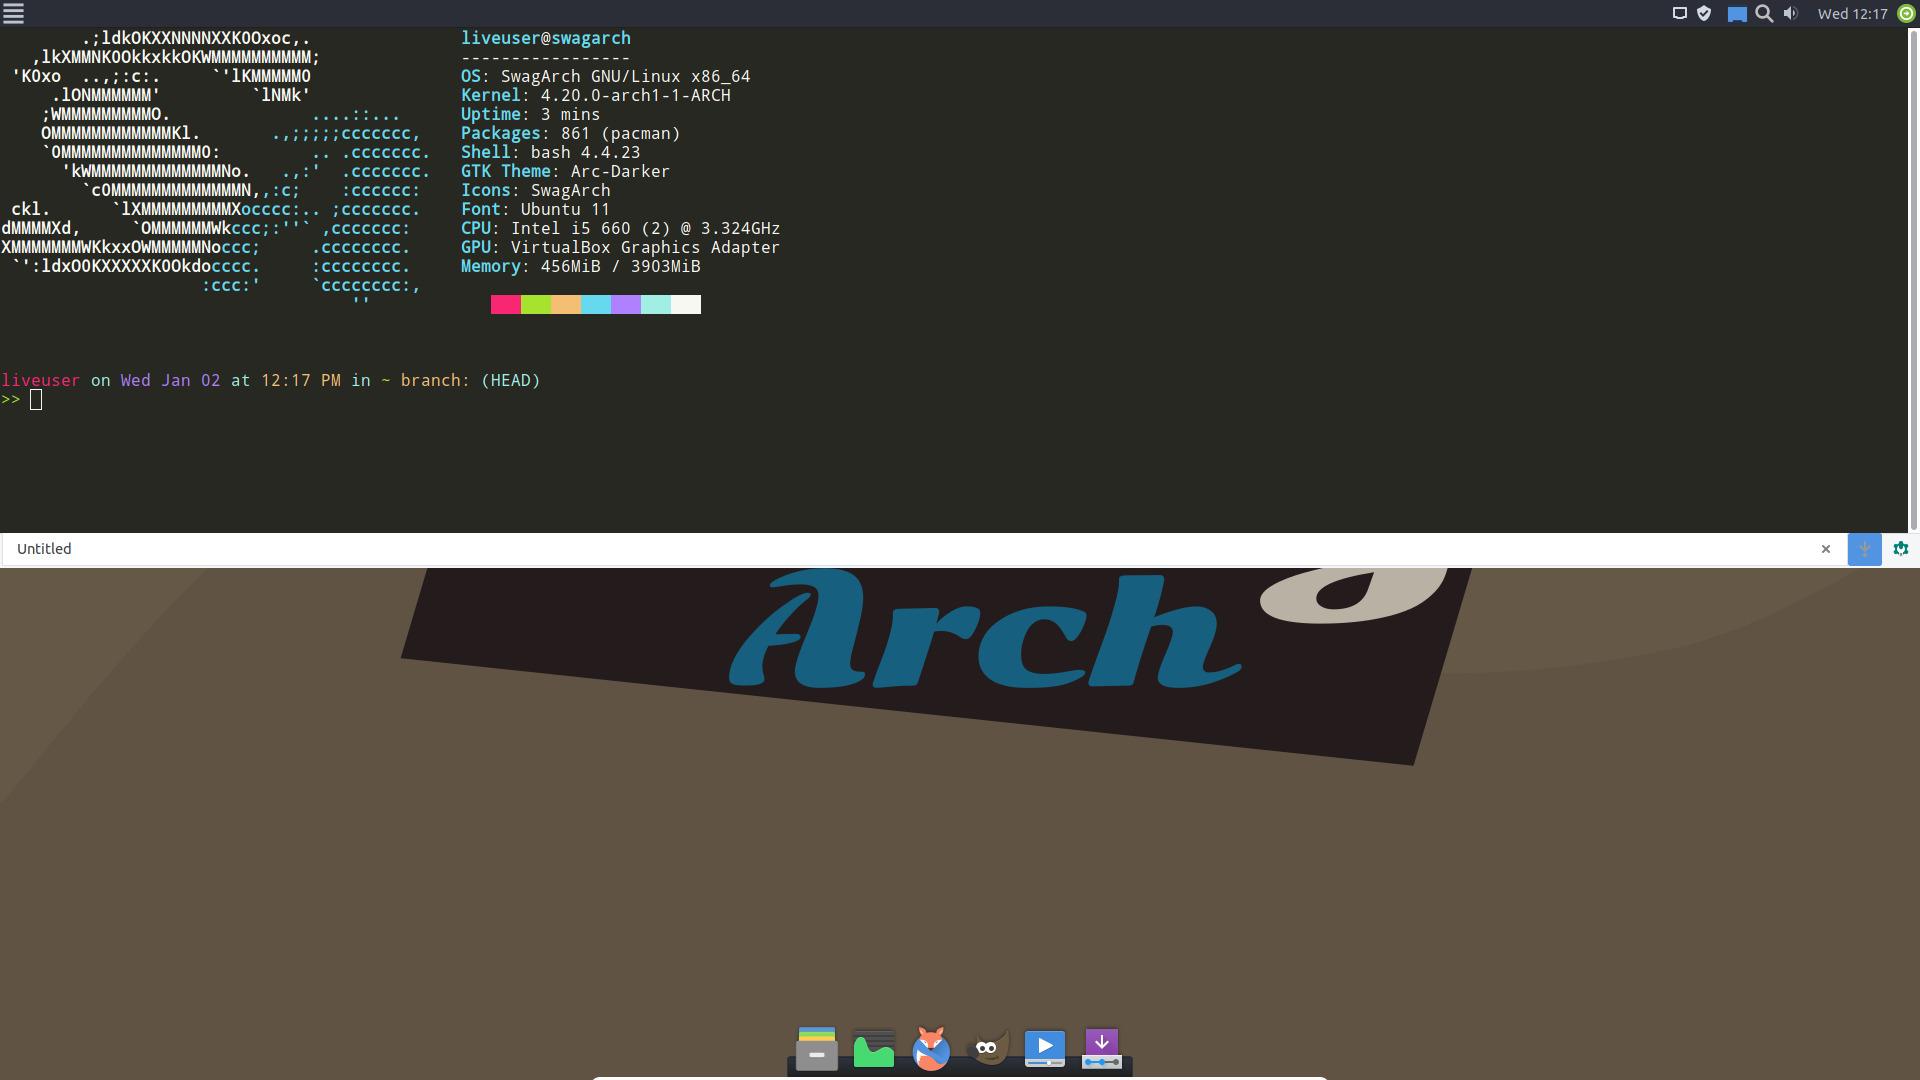 images/terminal.jpg